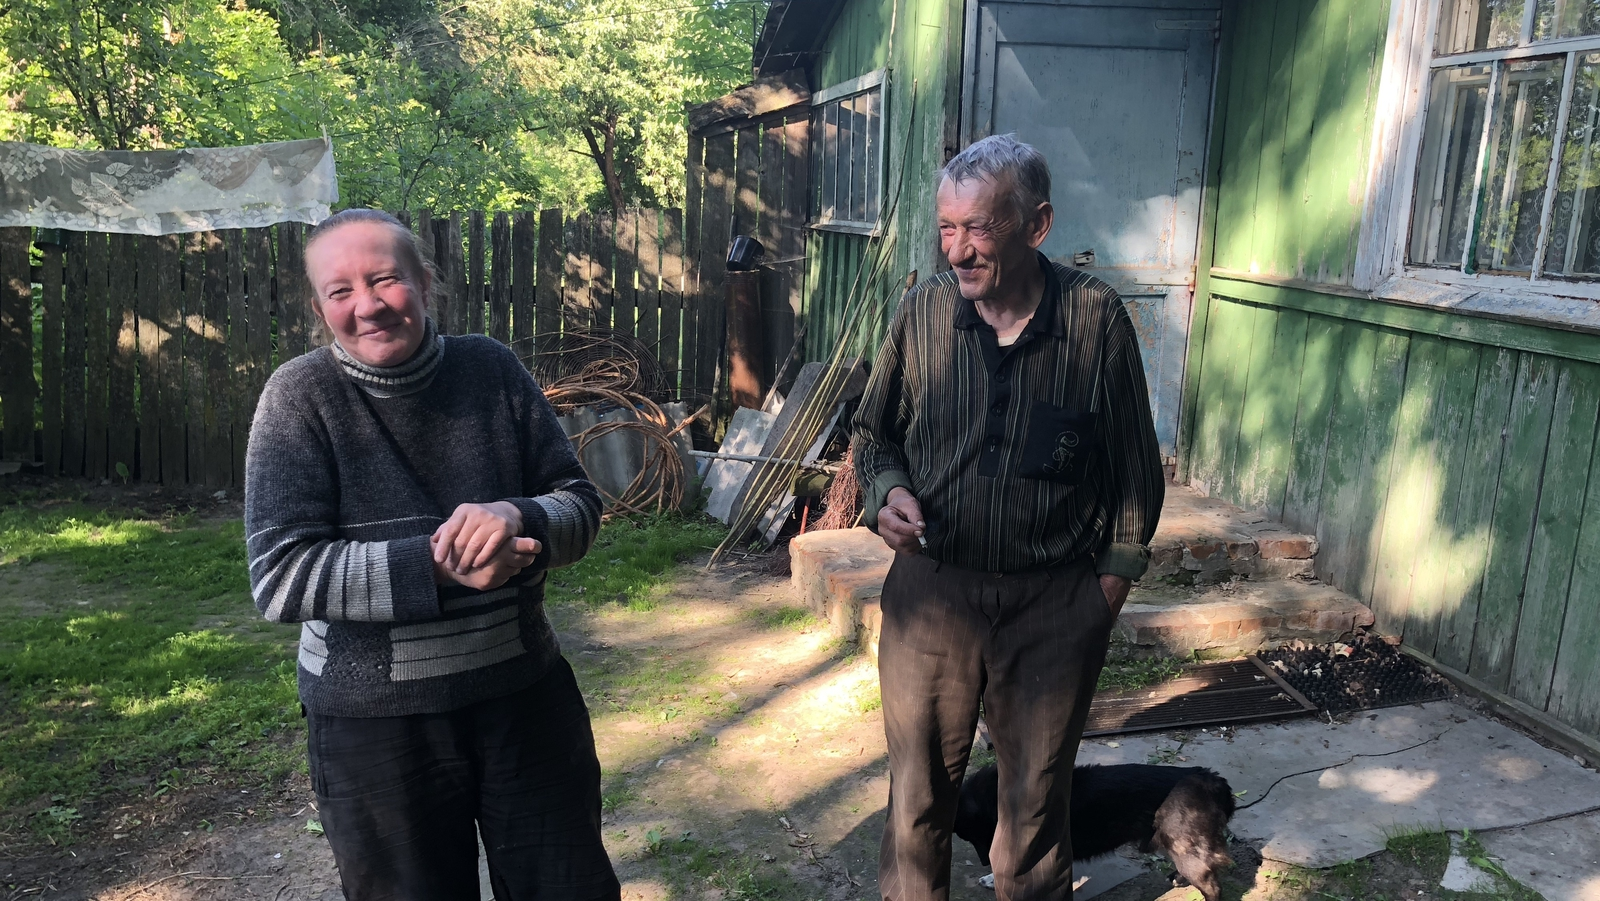 Image - Sveta Shelkunova and Peter Belyakov outside their home in what remains of Bartholomevka village